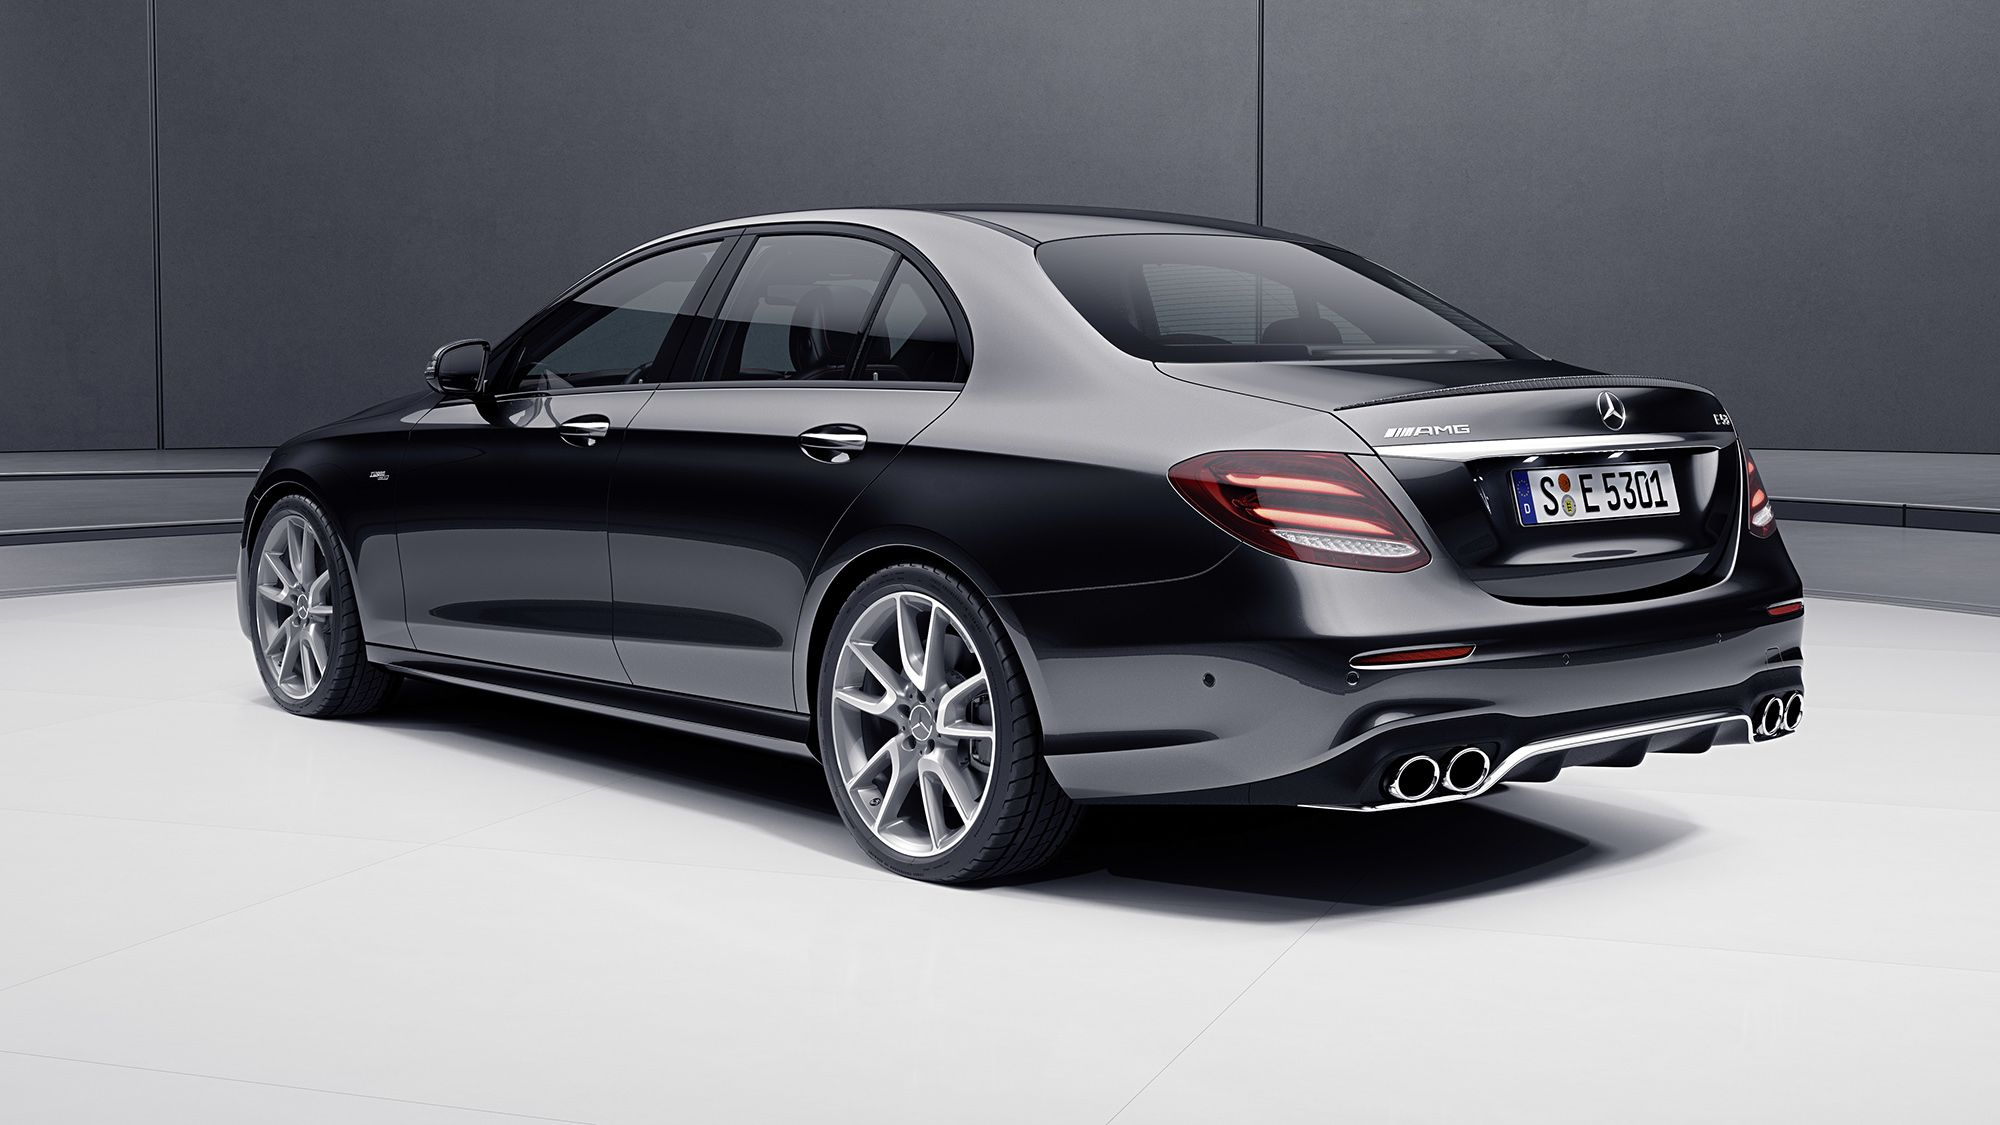 2019 Mercedes Benz E Class Revealed Benz E Sedan New Mercedes Amg